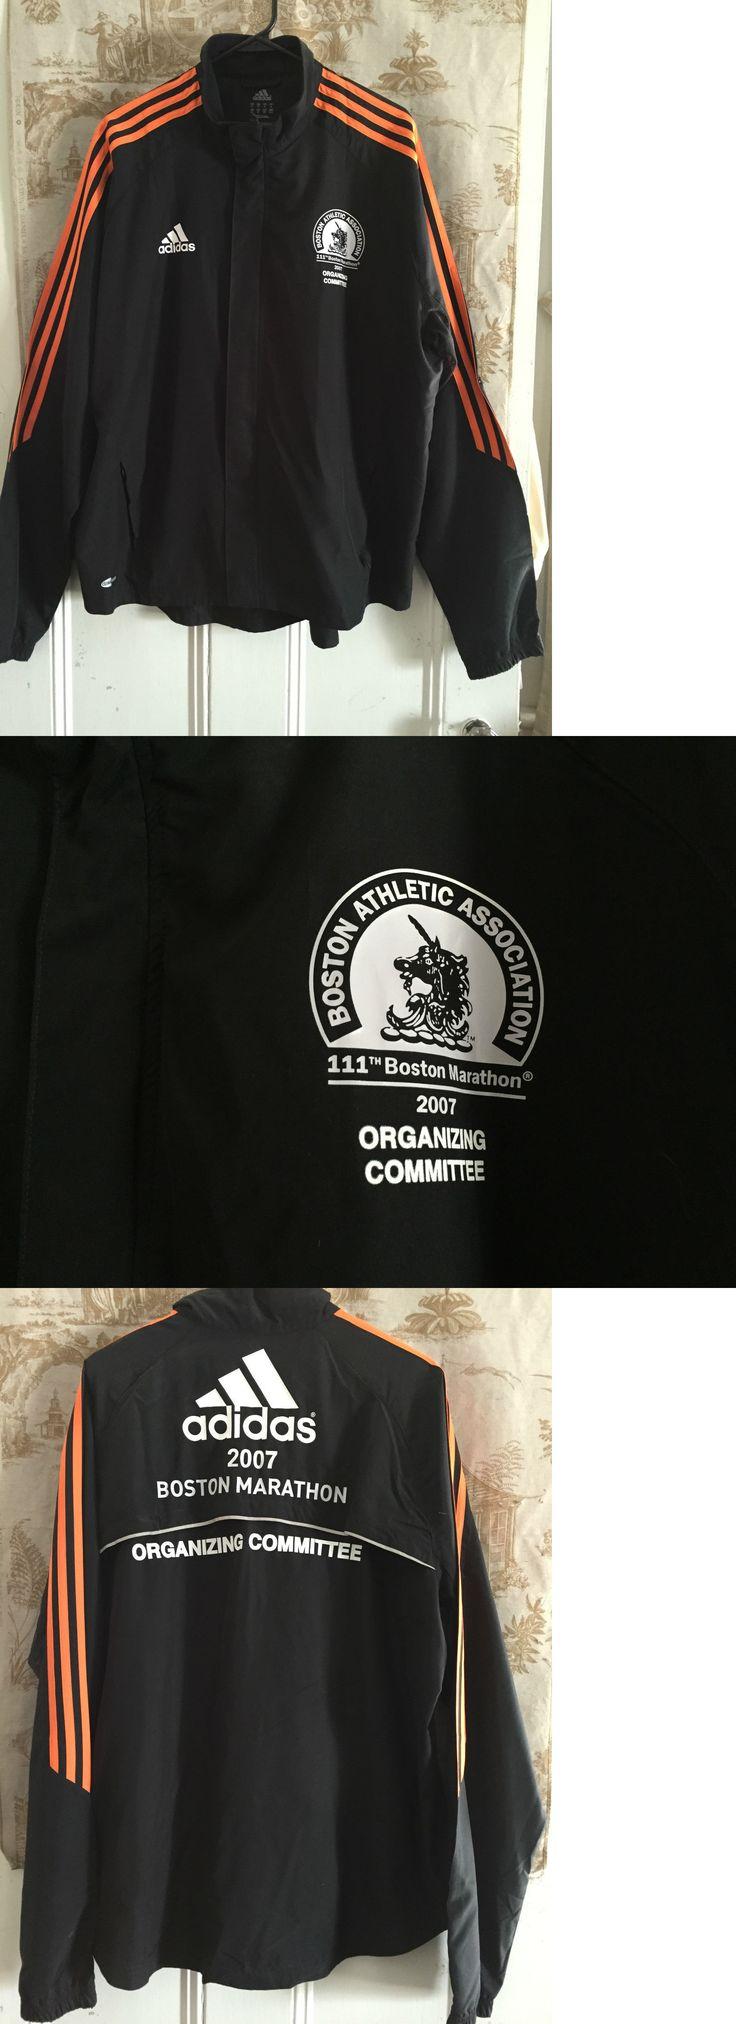 Other Mens Fitness Clothing 40892: 2007 Adidas Boston Marathon Organizing Committee Jacket Xl -> BUY IT NOW ONLY: $33 on eBay!